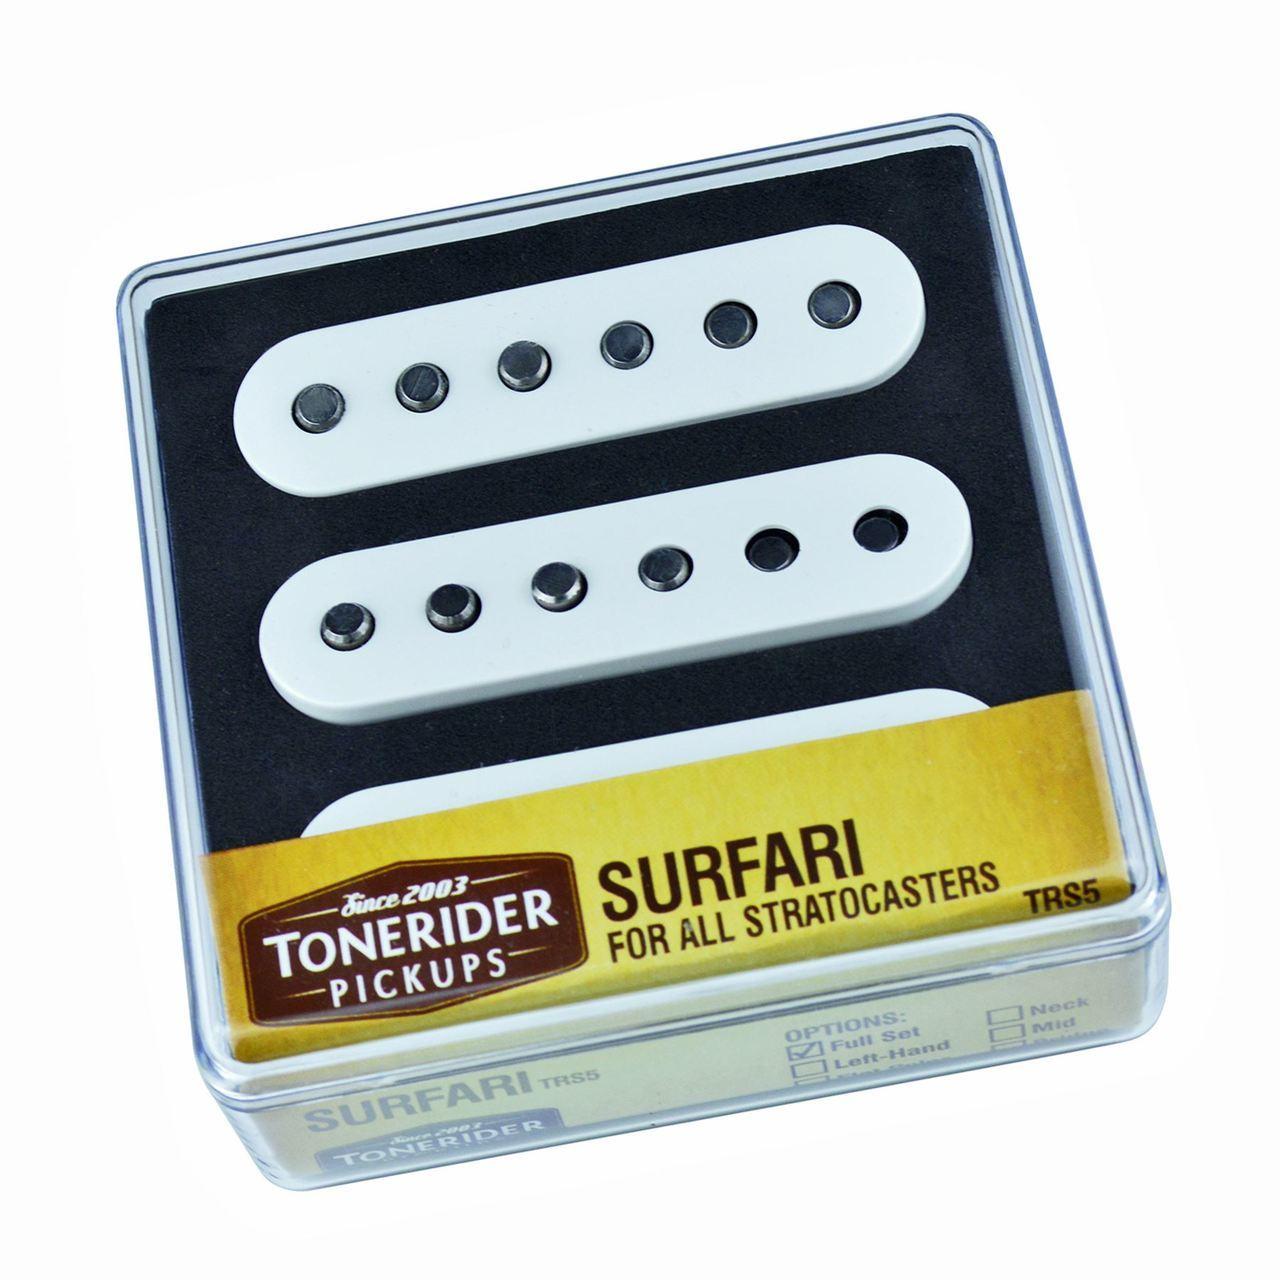 tonerider surfari stratocaster guitar pickups trs5 guitarshop folkestone. Black Bedroom Furniture Sets. Home Design Ideas